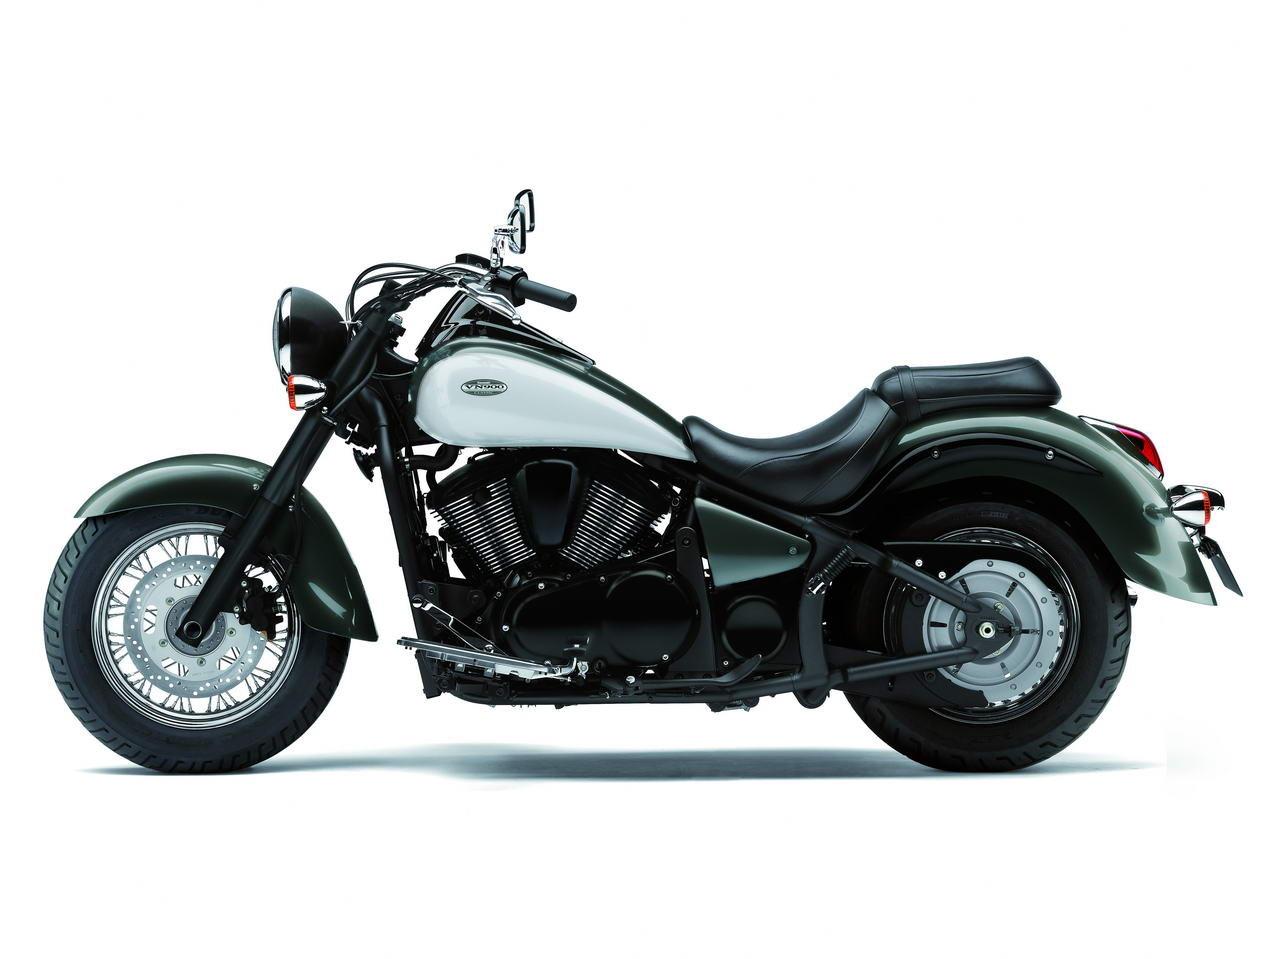 Listino Kawasaki Ninja ZX-10R SuperBike 1000 - image 15527_kawasaki-vn1700-classic-tourer on https://moto.motori.net